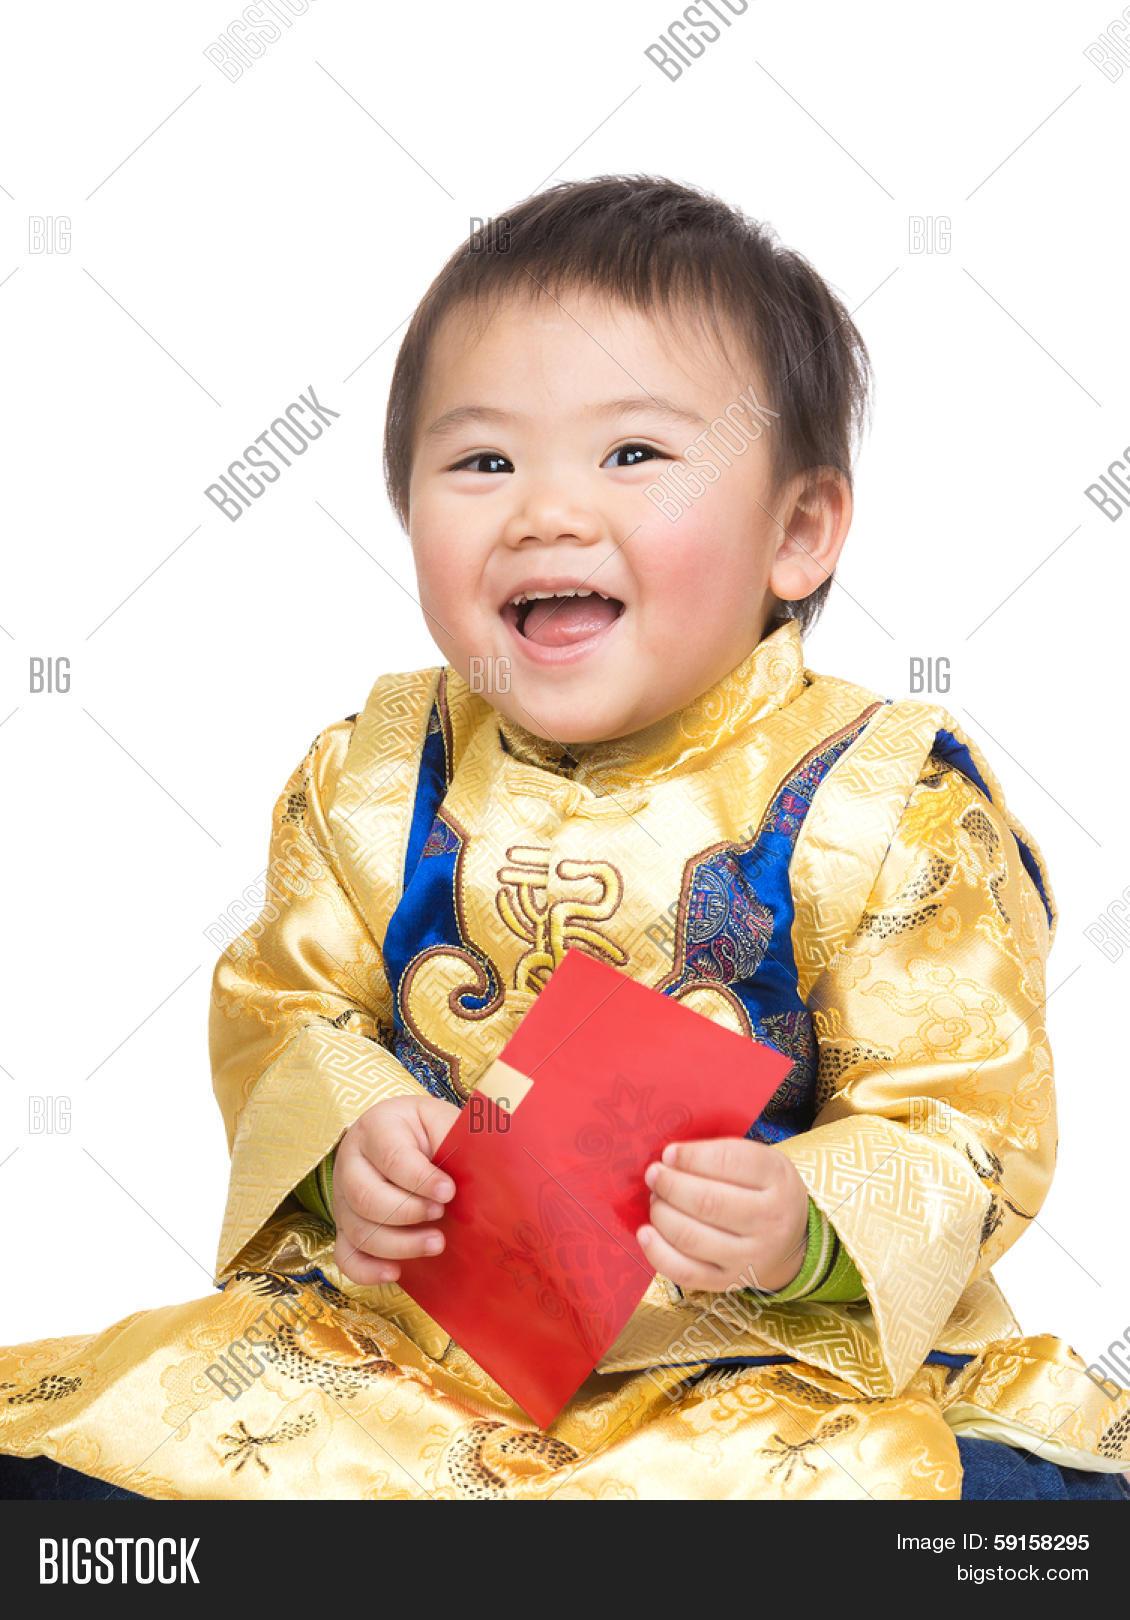 439857976 Chinese Baby Image & Photo (Free Trial) | Bigstock